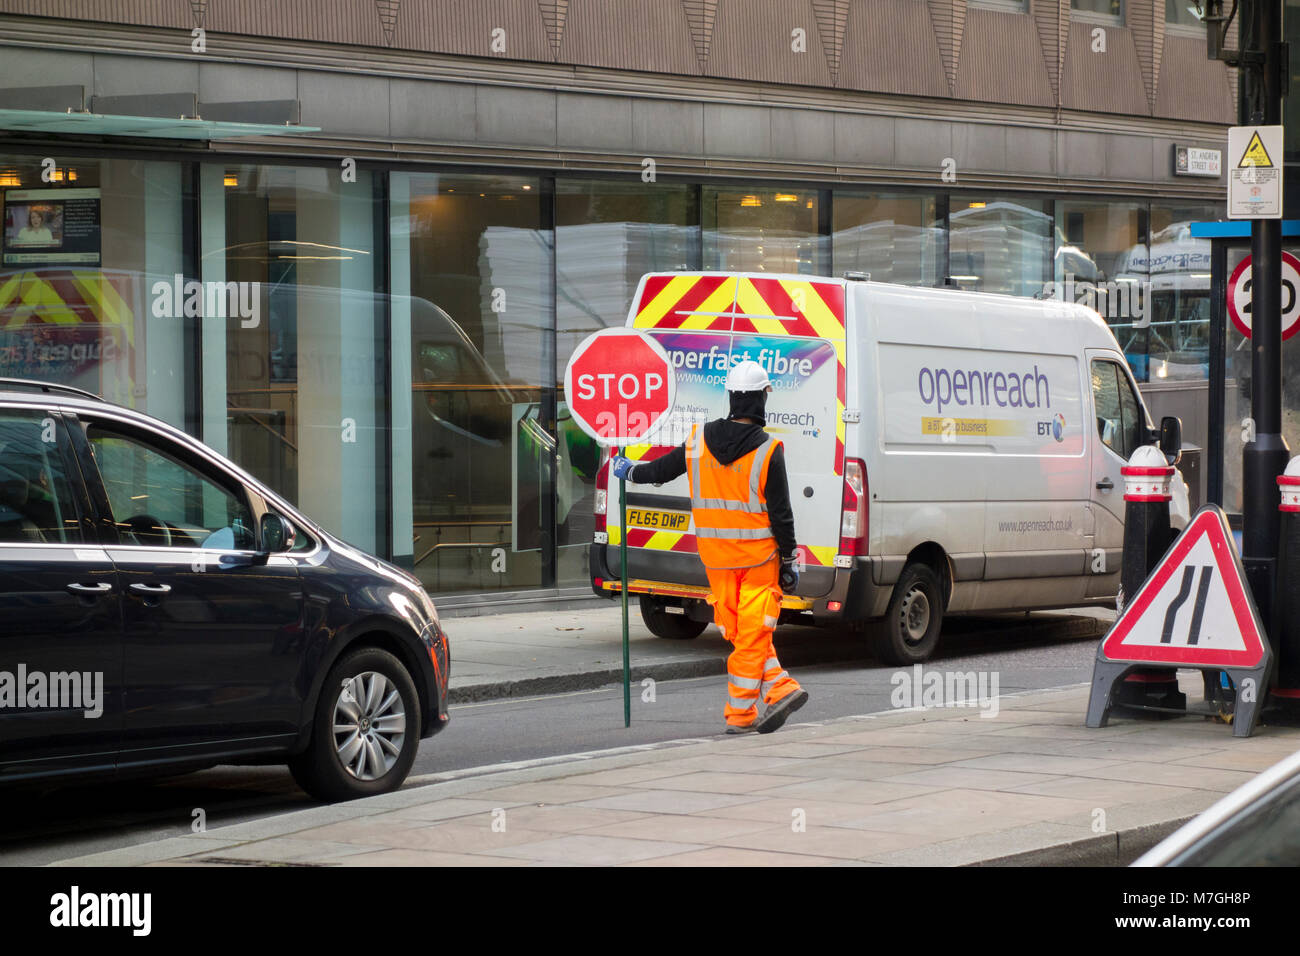 Workman in high vis holding stop sign in front of BT Openreach superfast fibre van - Stock Image